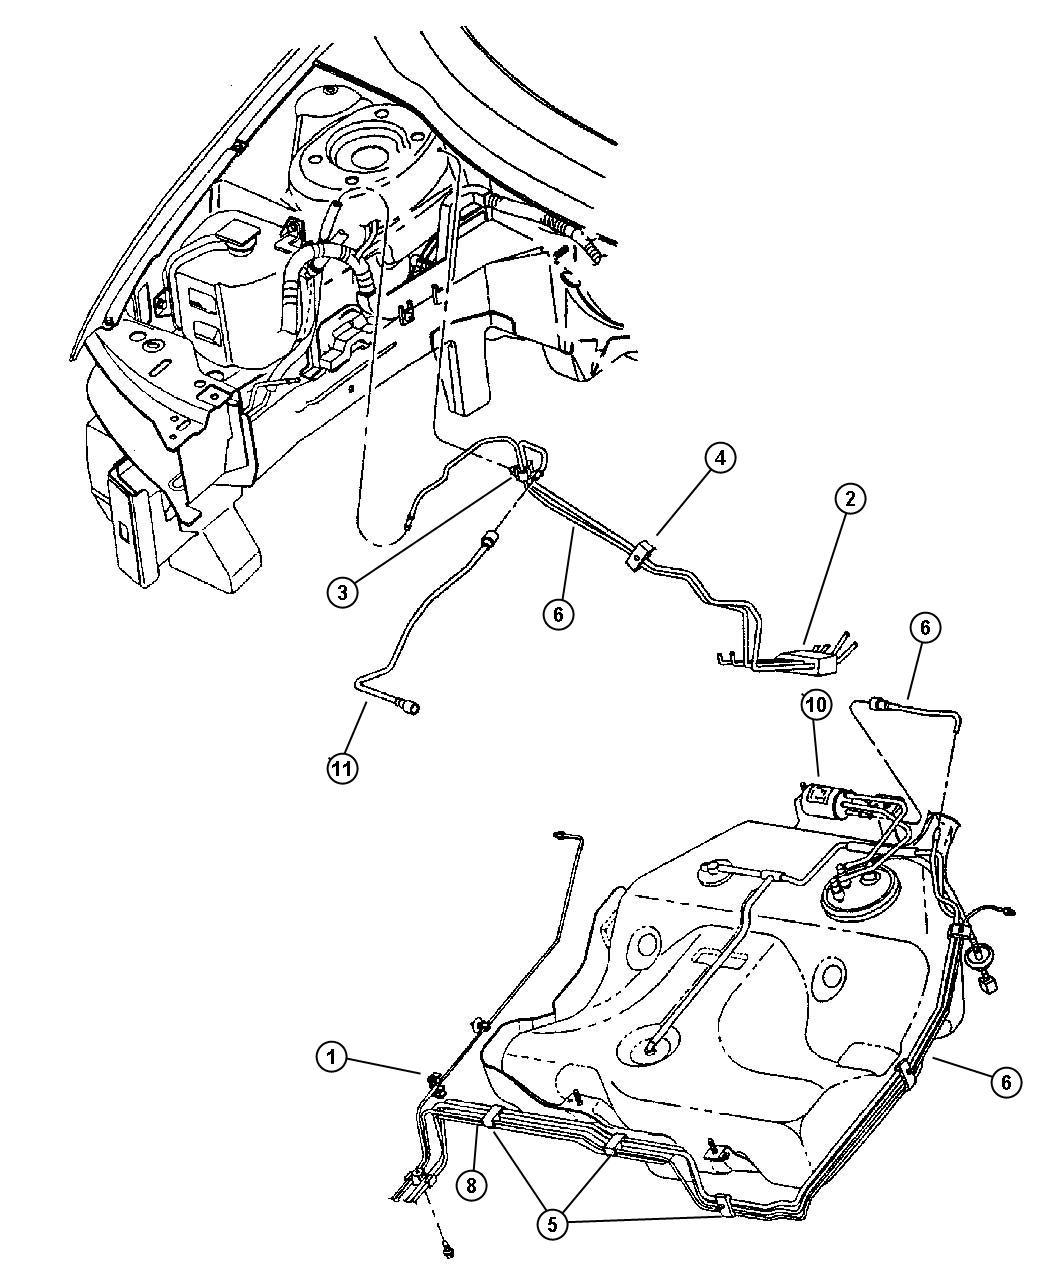 1999 Chrysler Sebring JX Convertible 2.5L V6 SOHC 24V SMPI